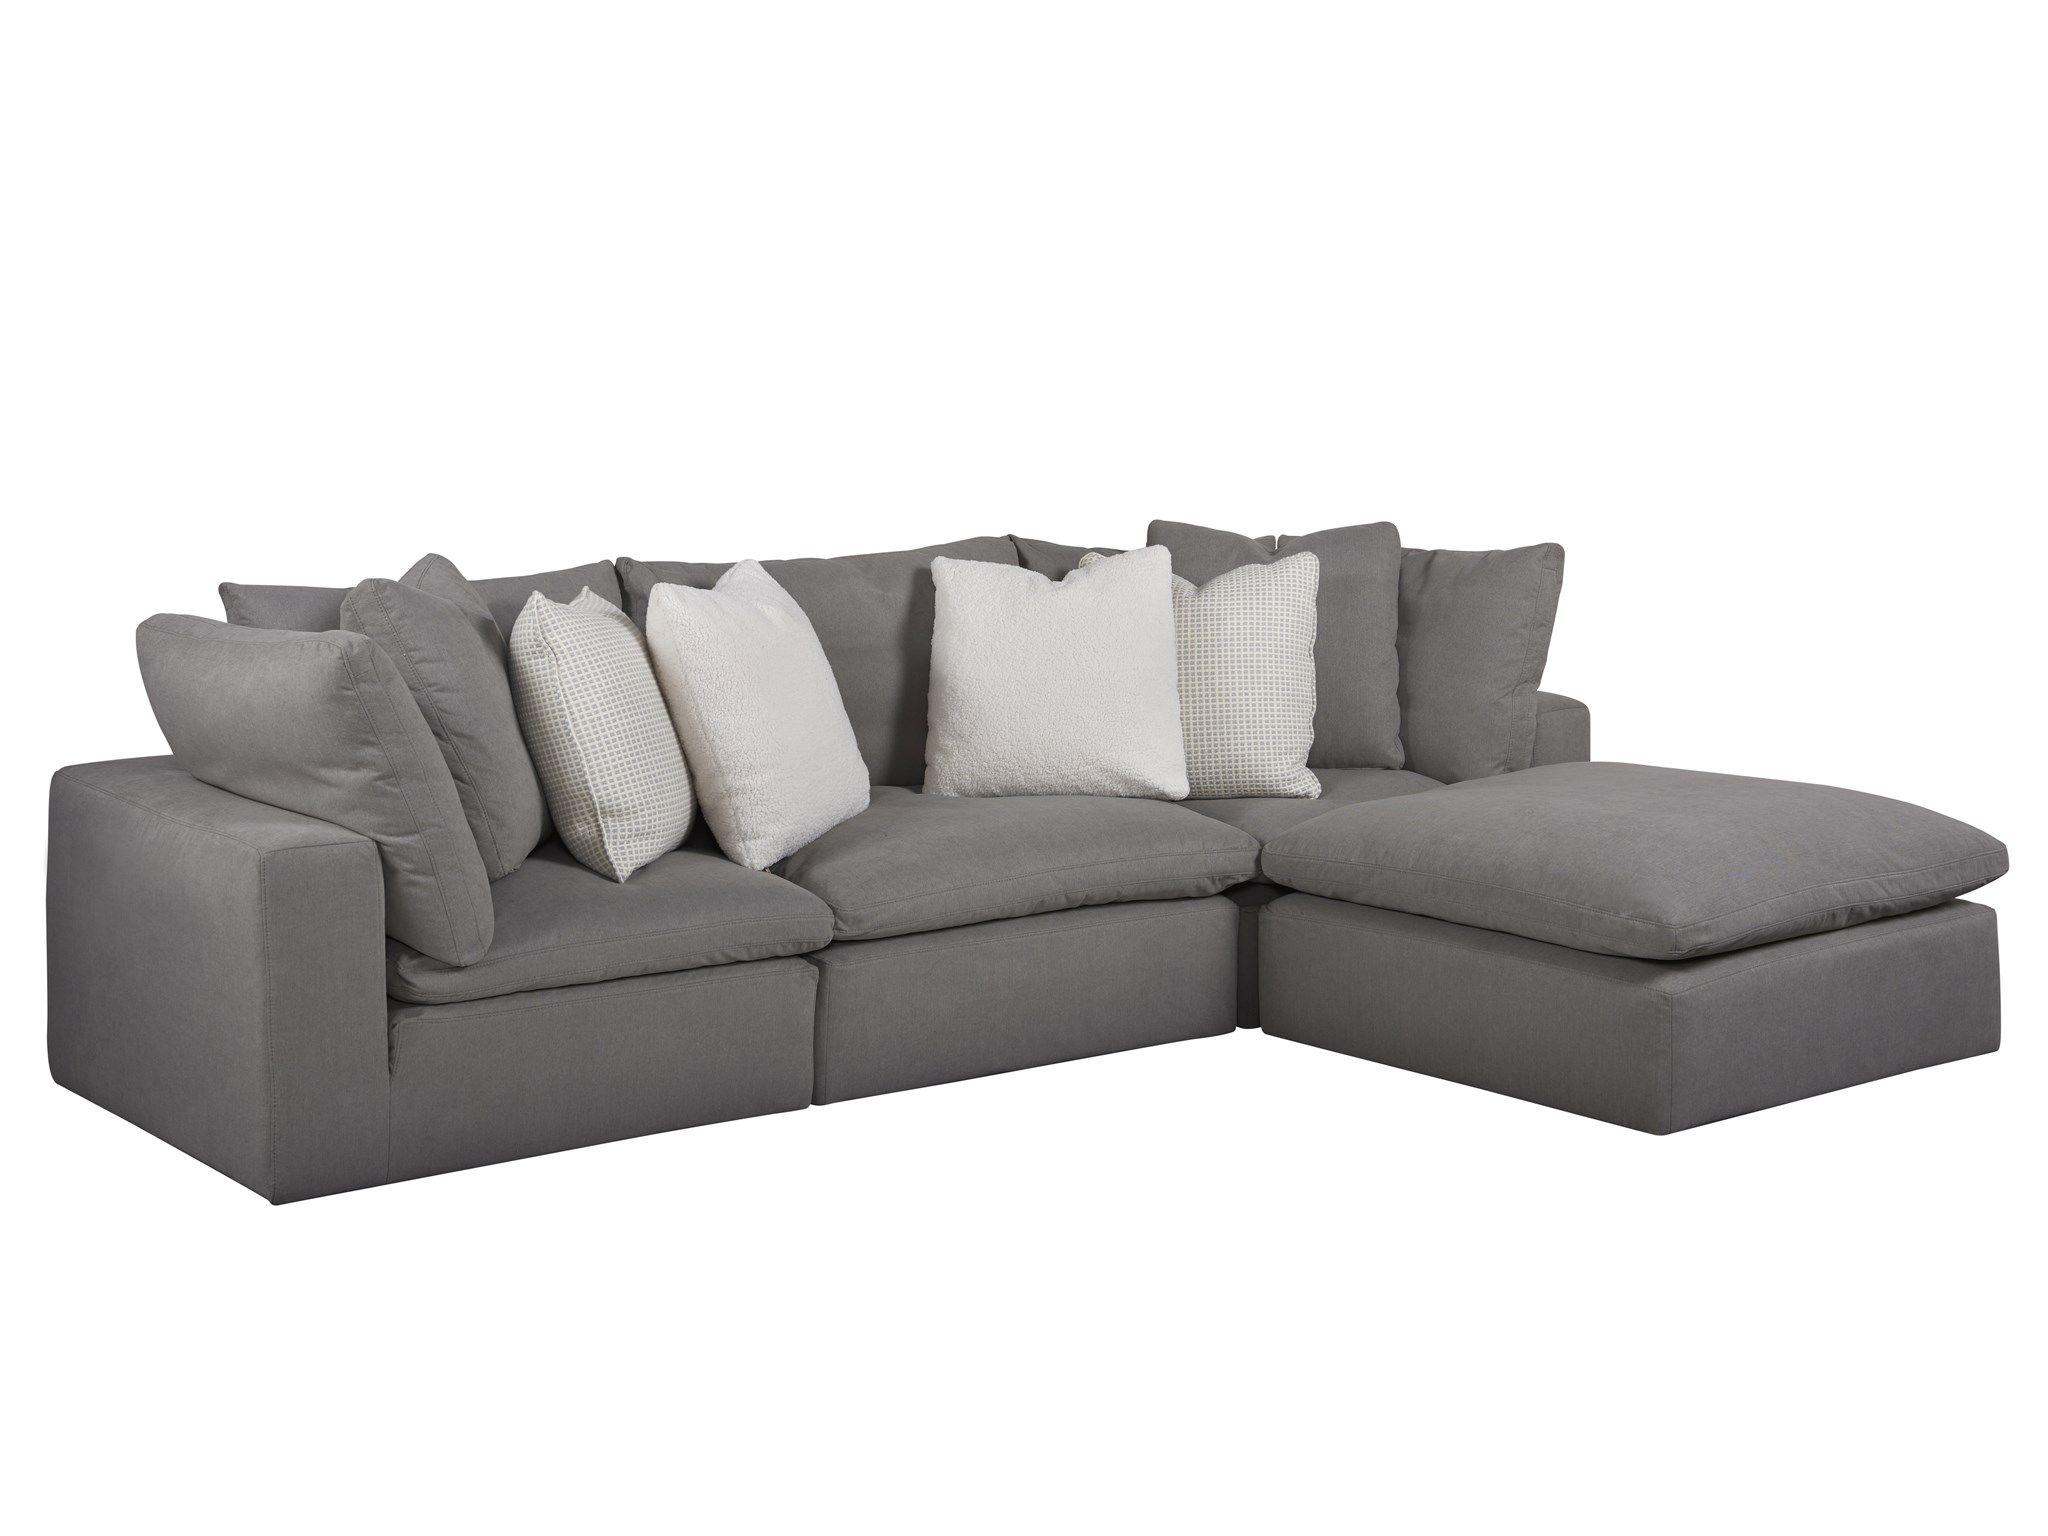 Universal Furniture Modern Palmer Sectional 4 Piece Universal Furniture Sectional Furniture